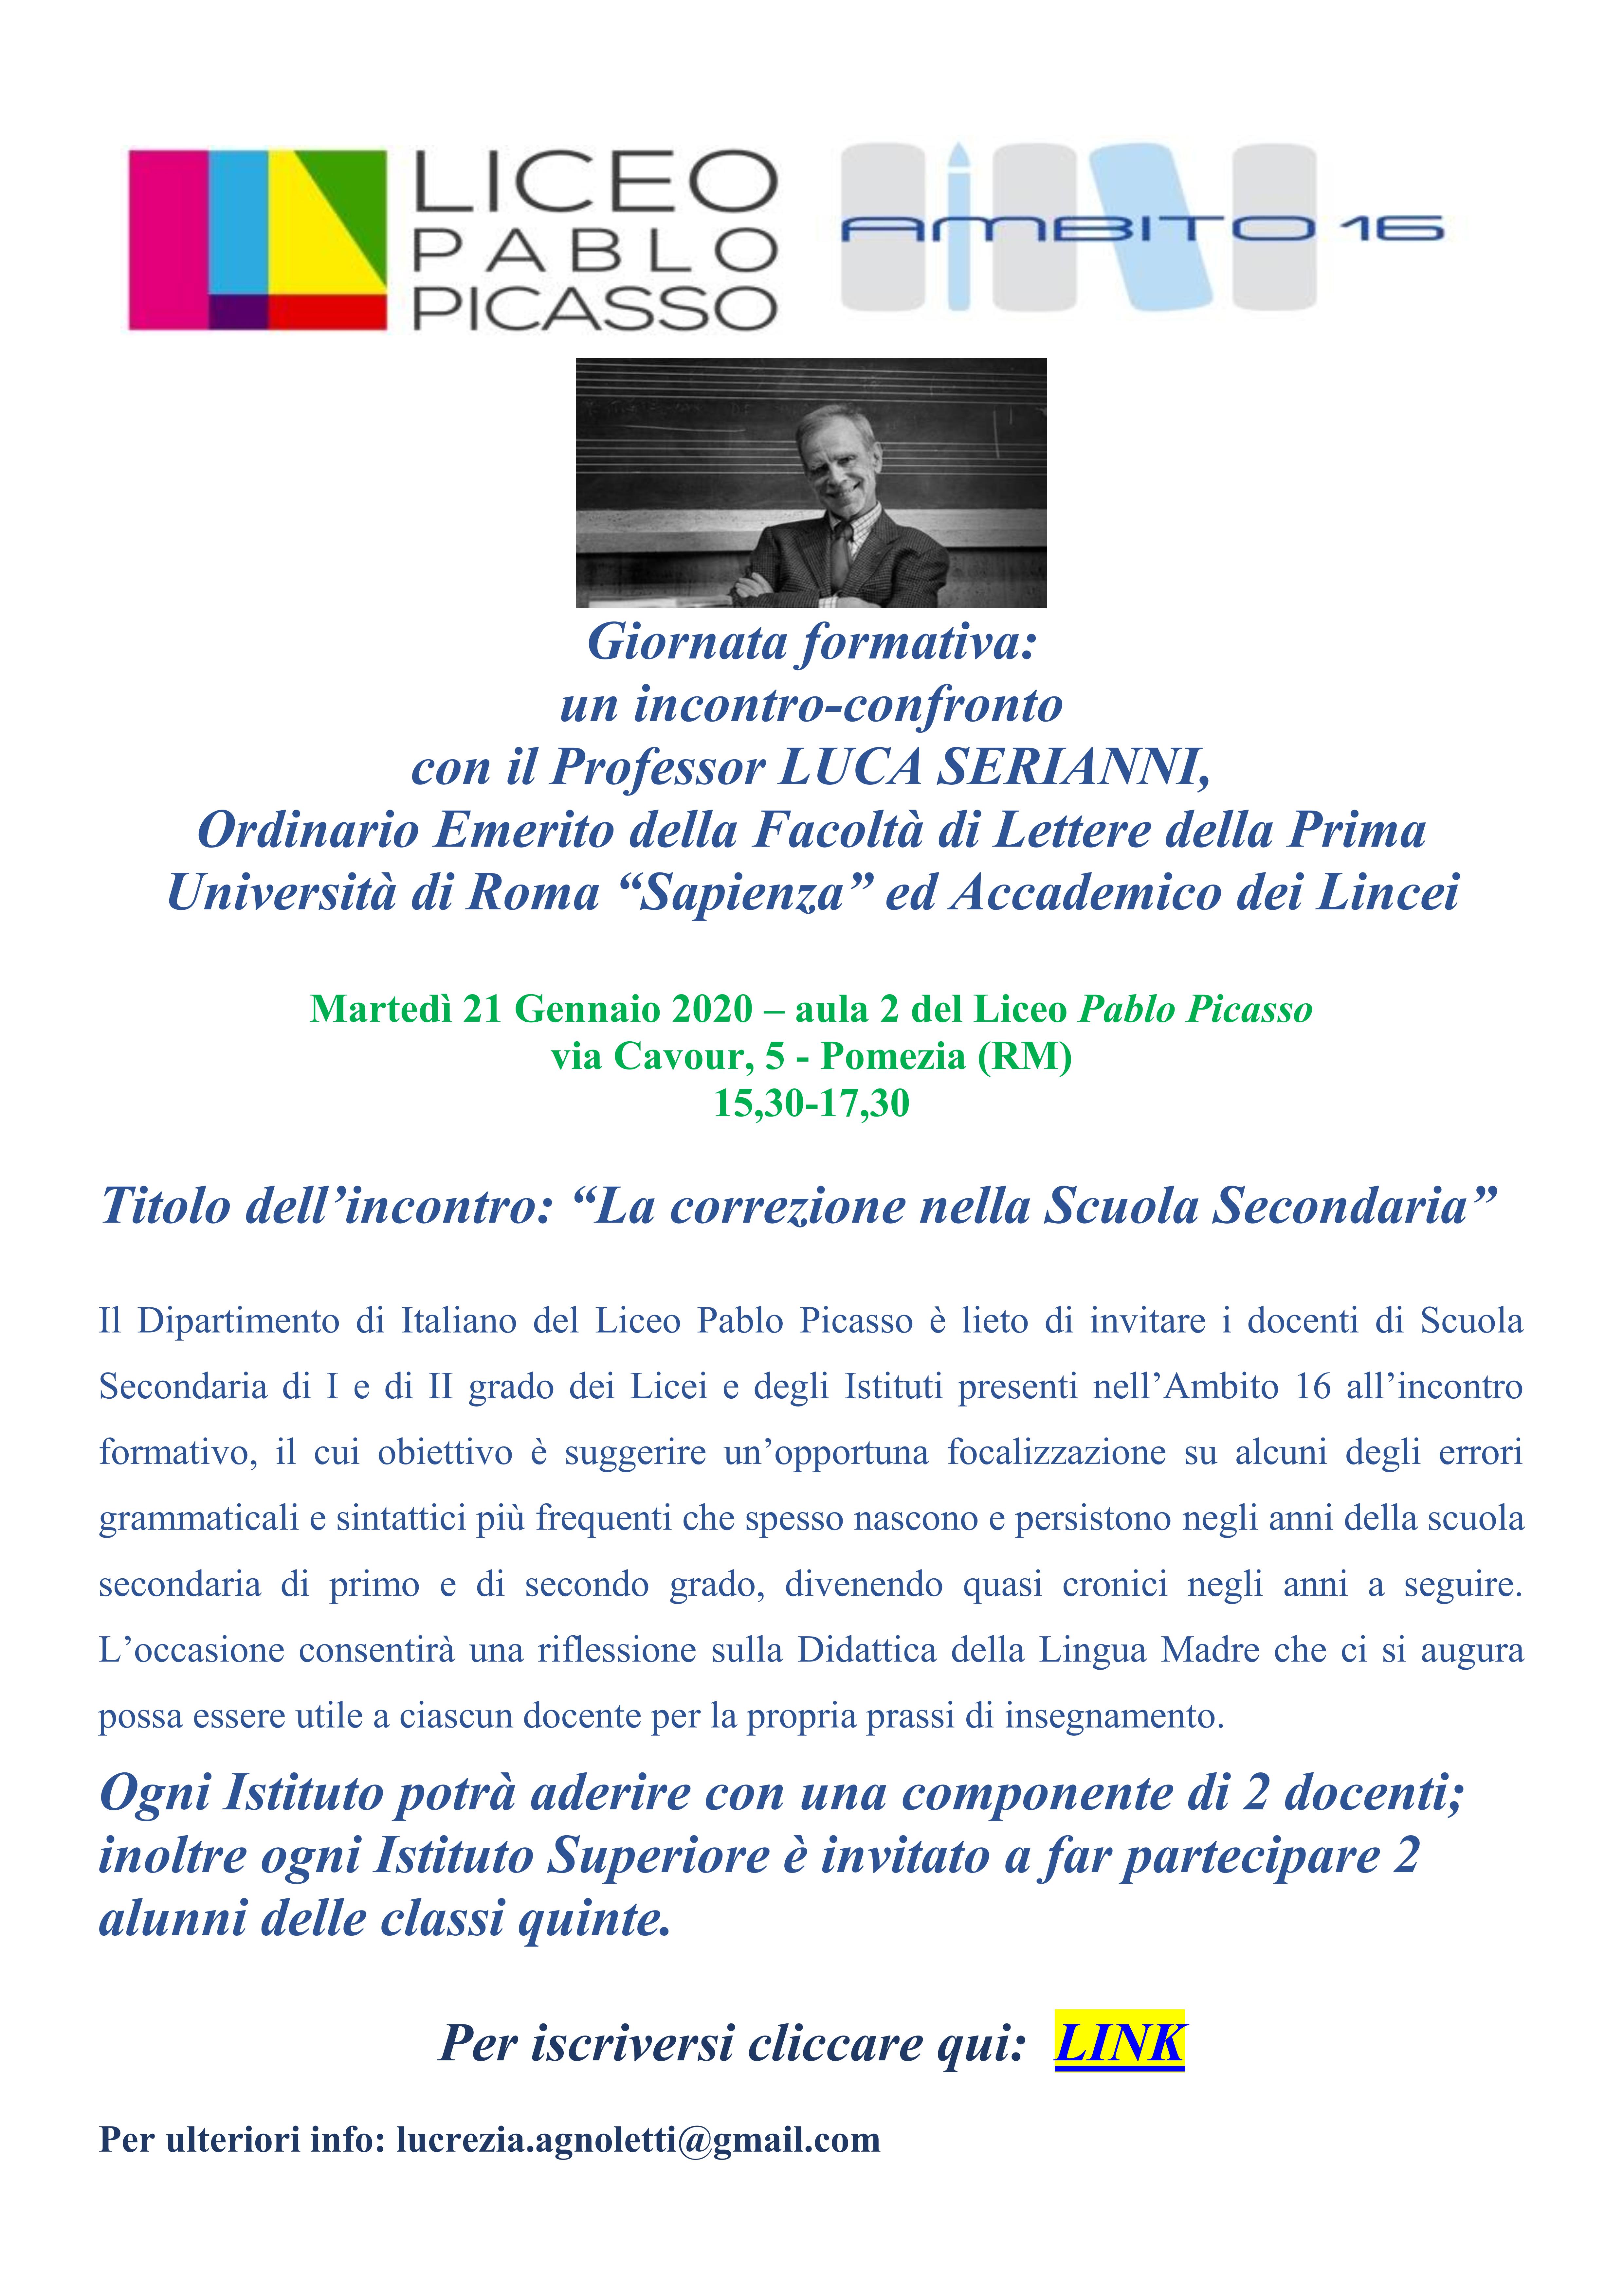 Locandina incontro SERIANNI 21-01-2020 001